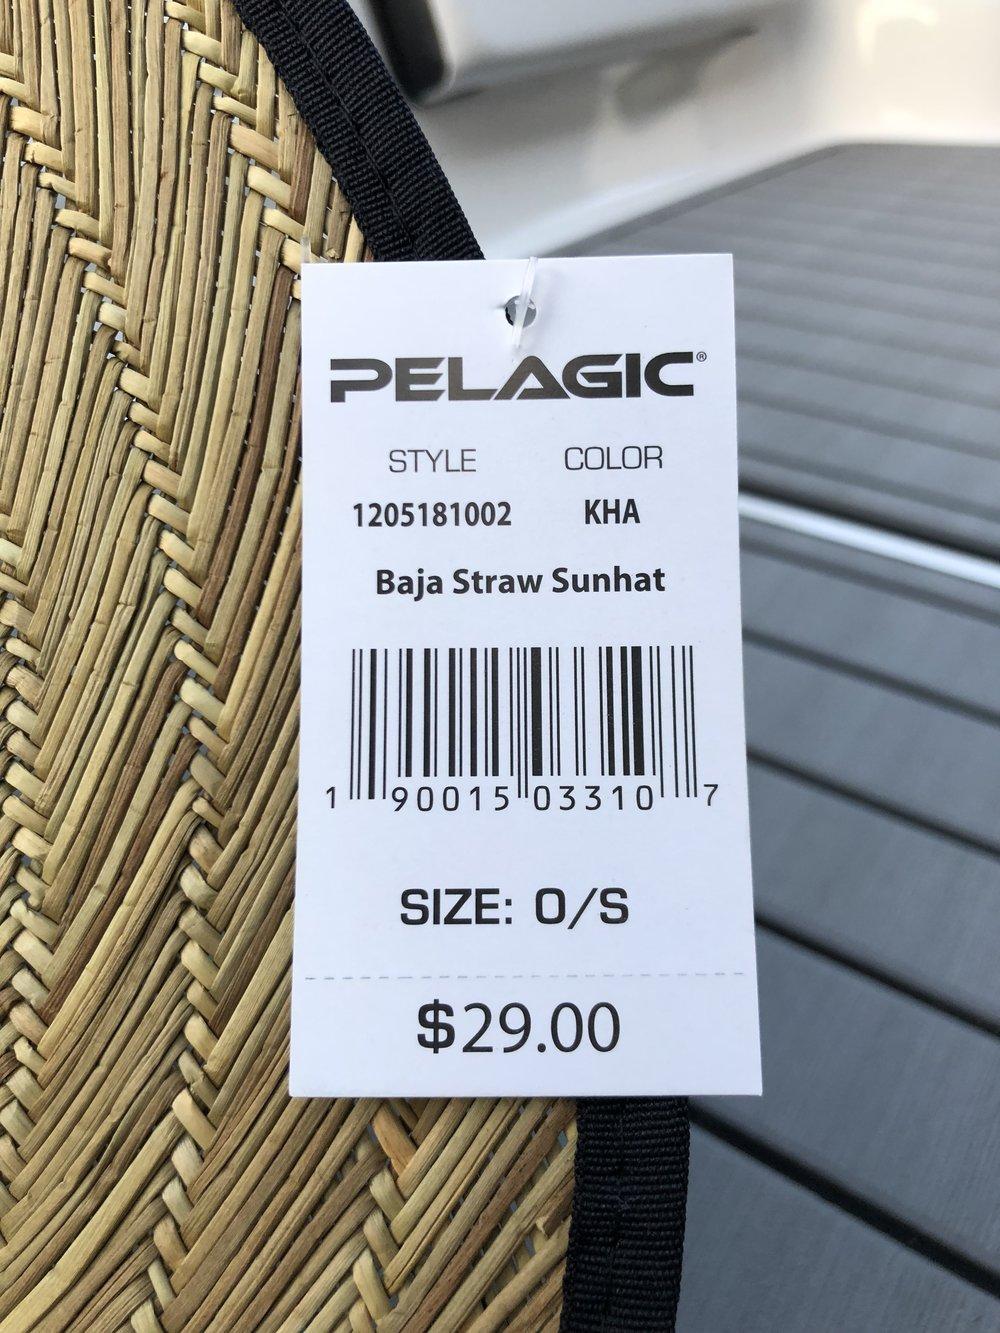 15d545c8e6690 Pelagic Baja Straw Hat Price Tag and Barcode